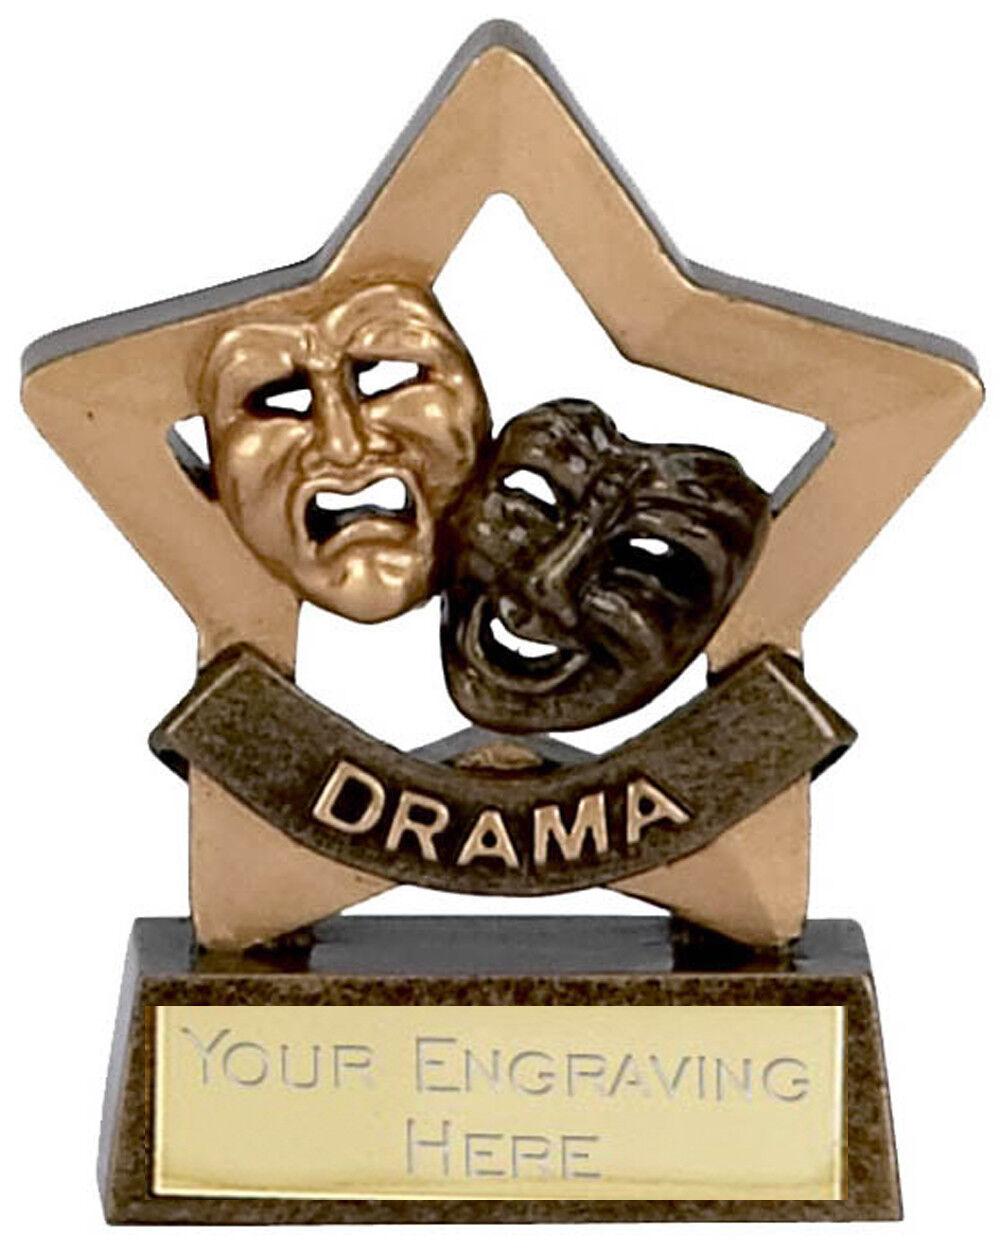 6 x DRAMA Star Trophies FREE ENGRAVING Personalised Engraved Awards 3.25  Club